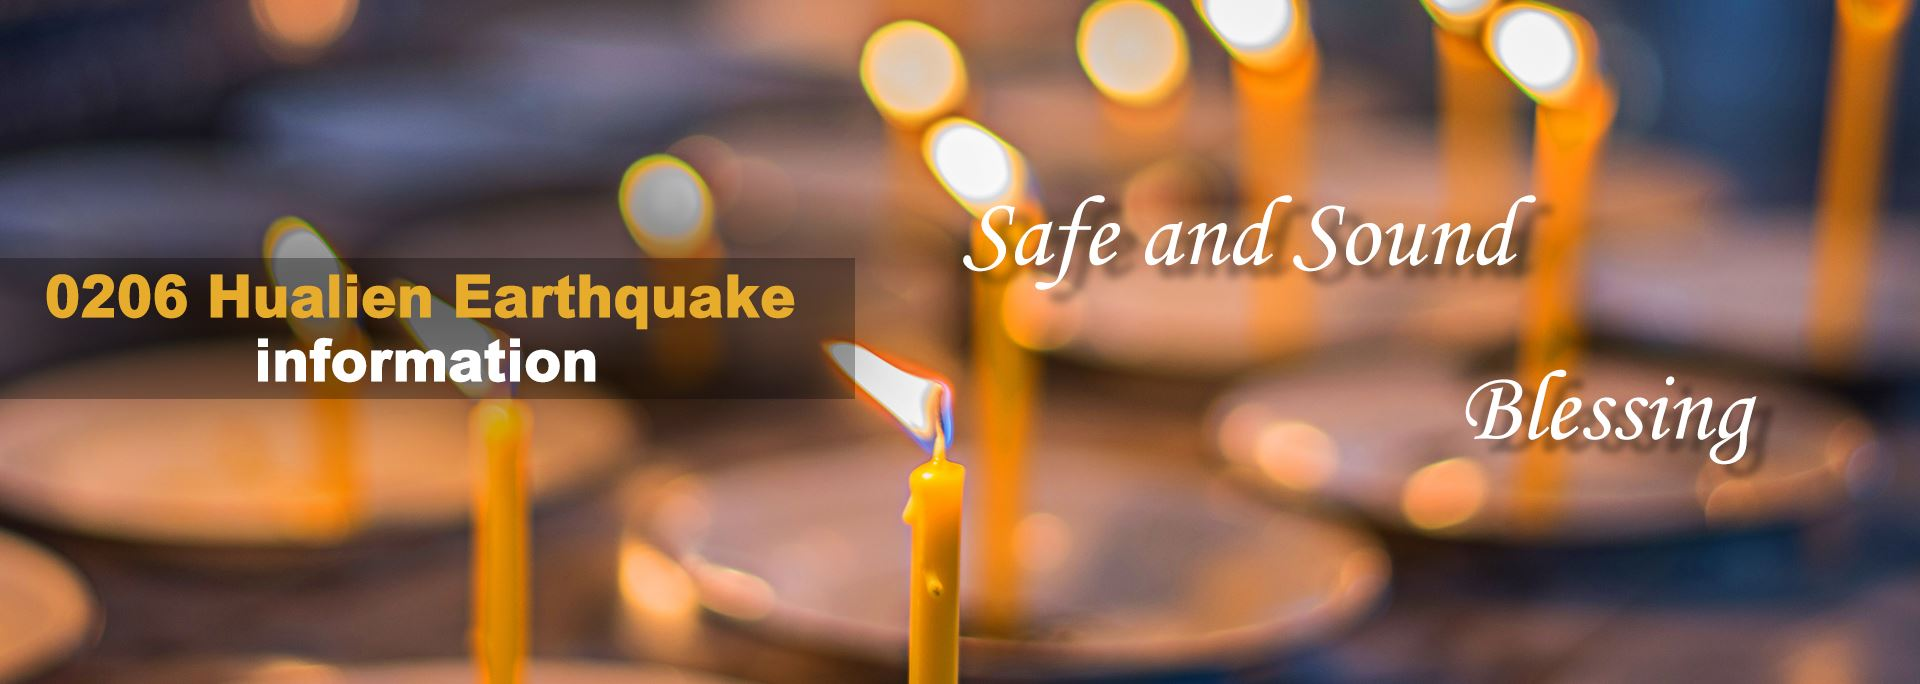 0206 Hualien Earthquake information